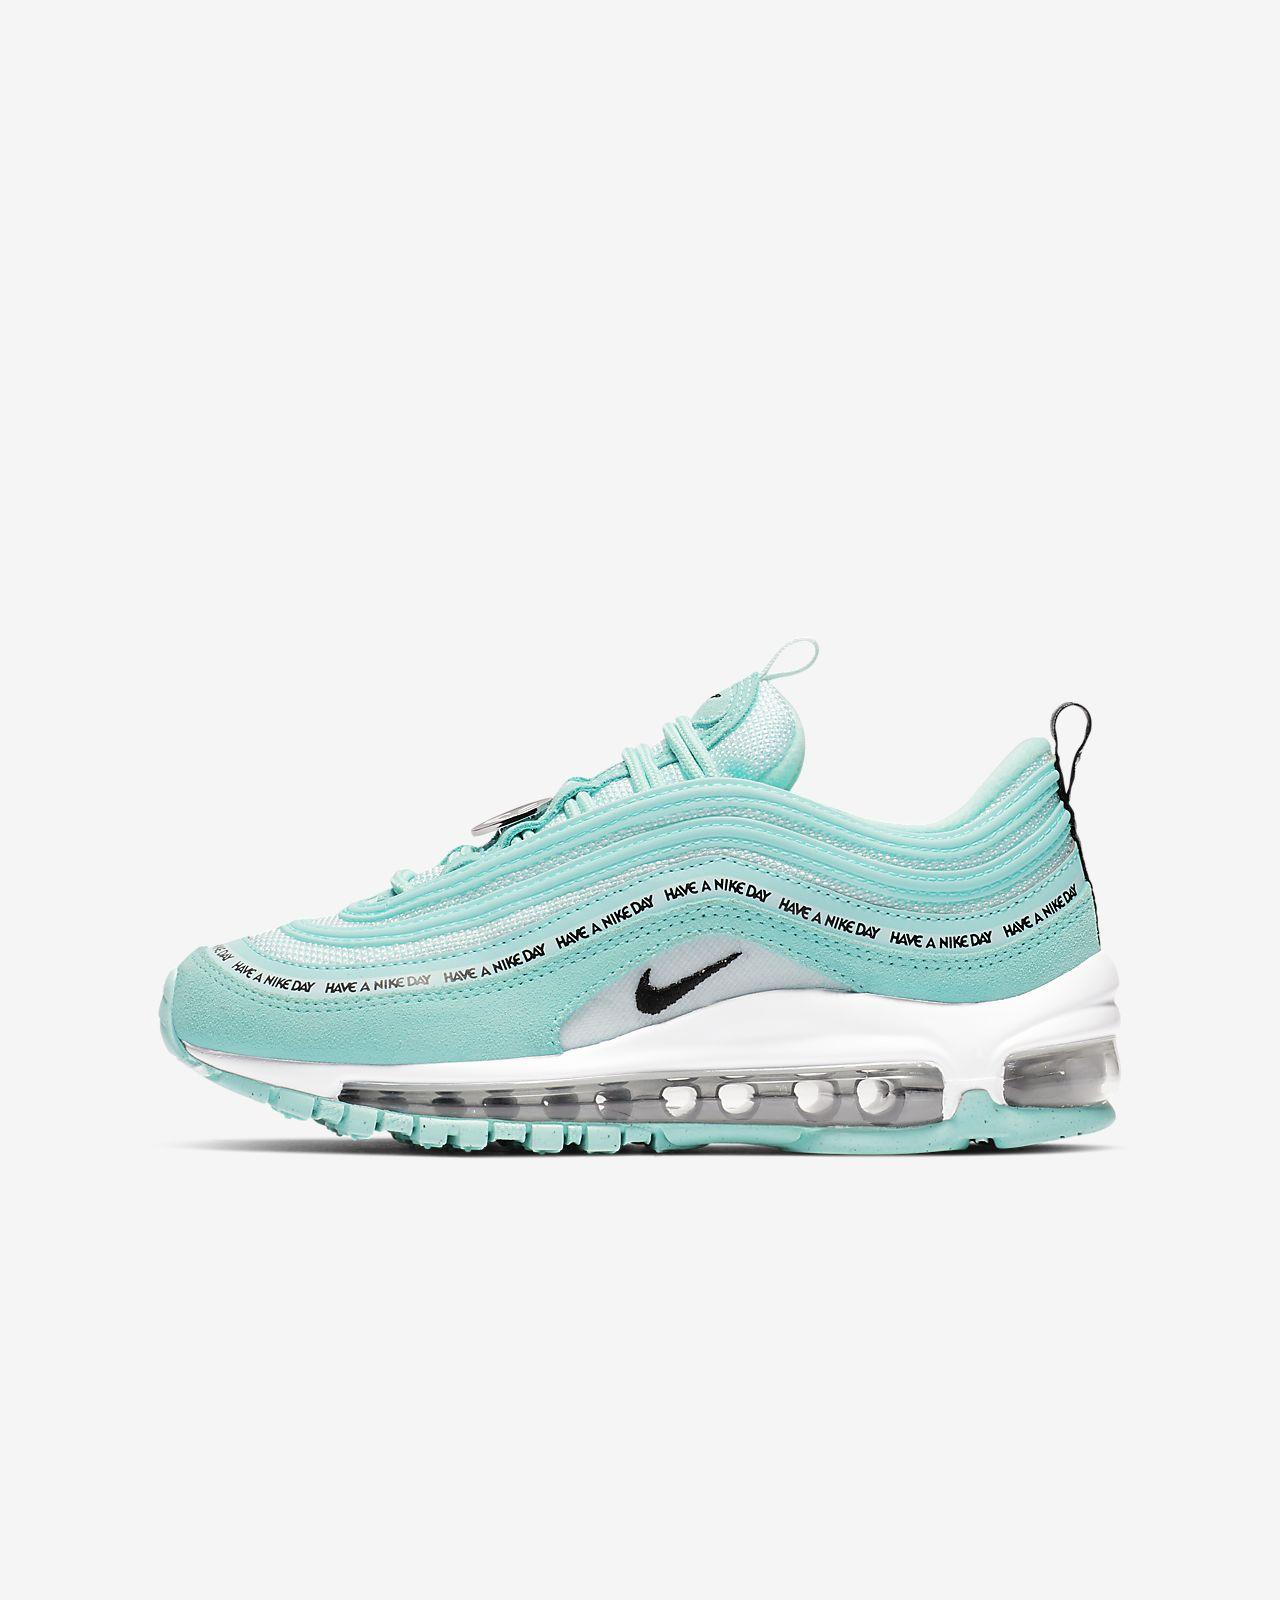 huge selection of 1f38e 47a6b Nike Air Max 97 SE Zapatillas - Niño a